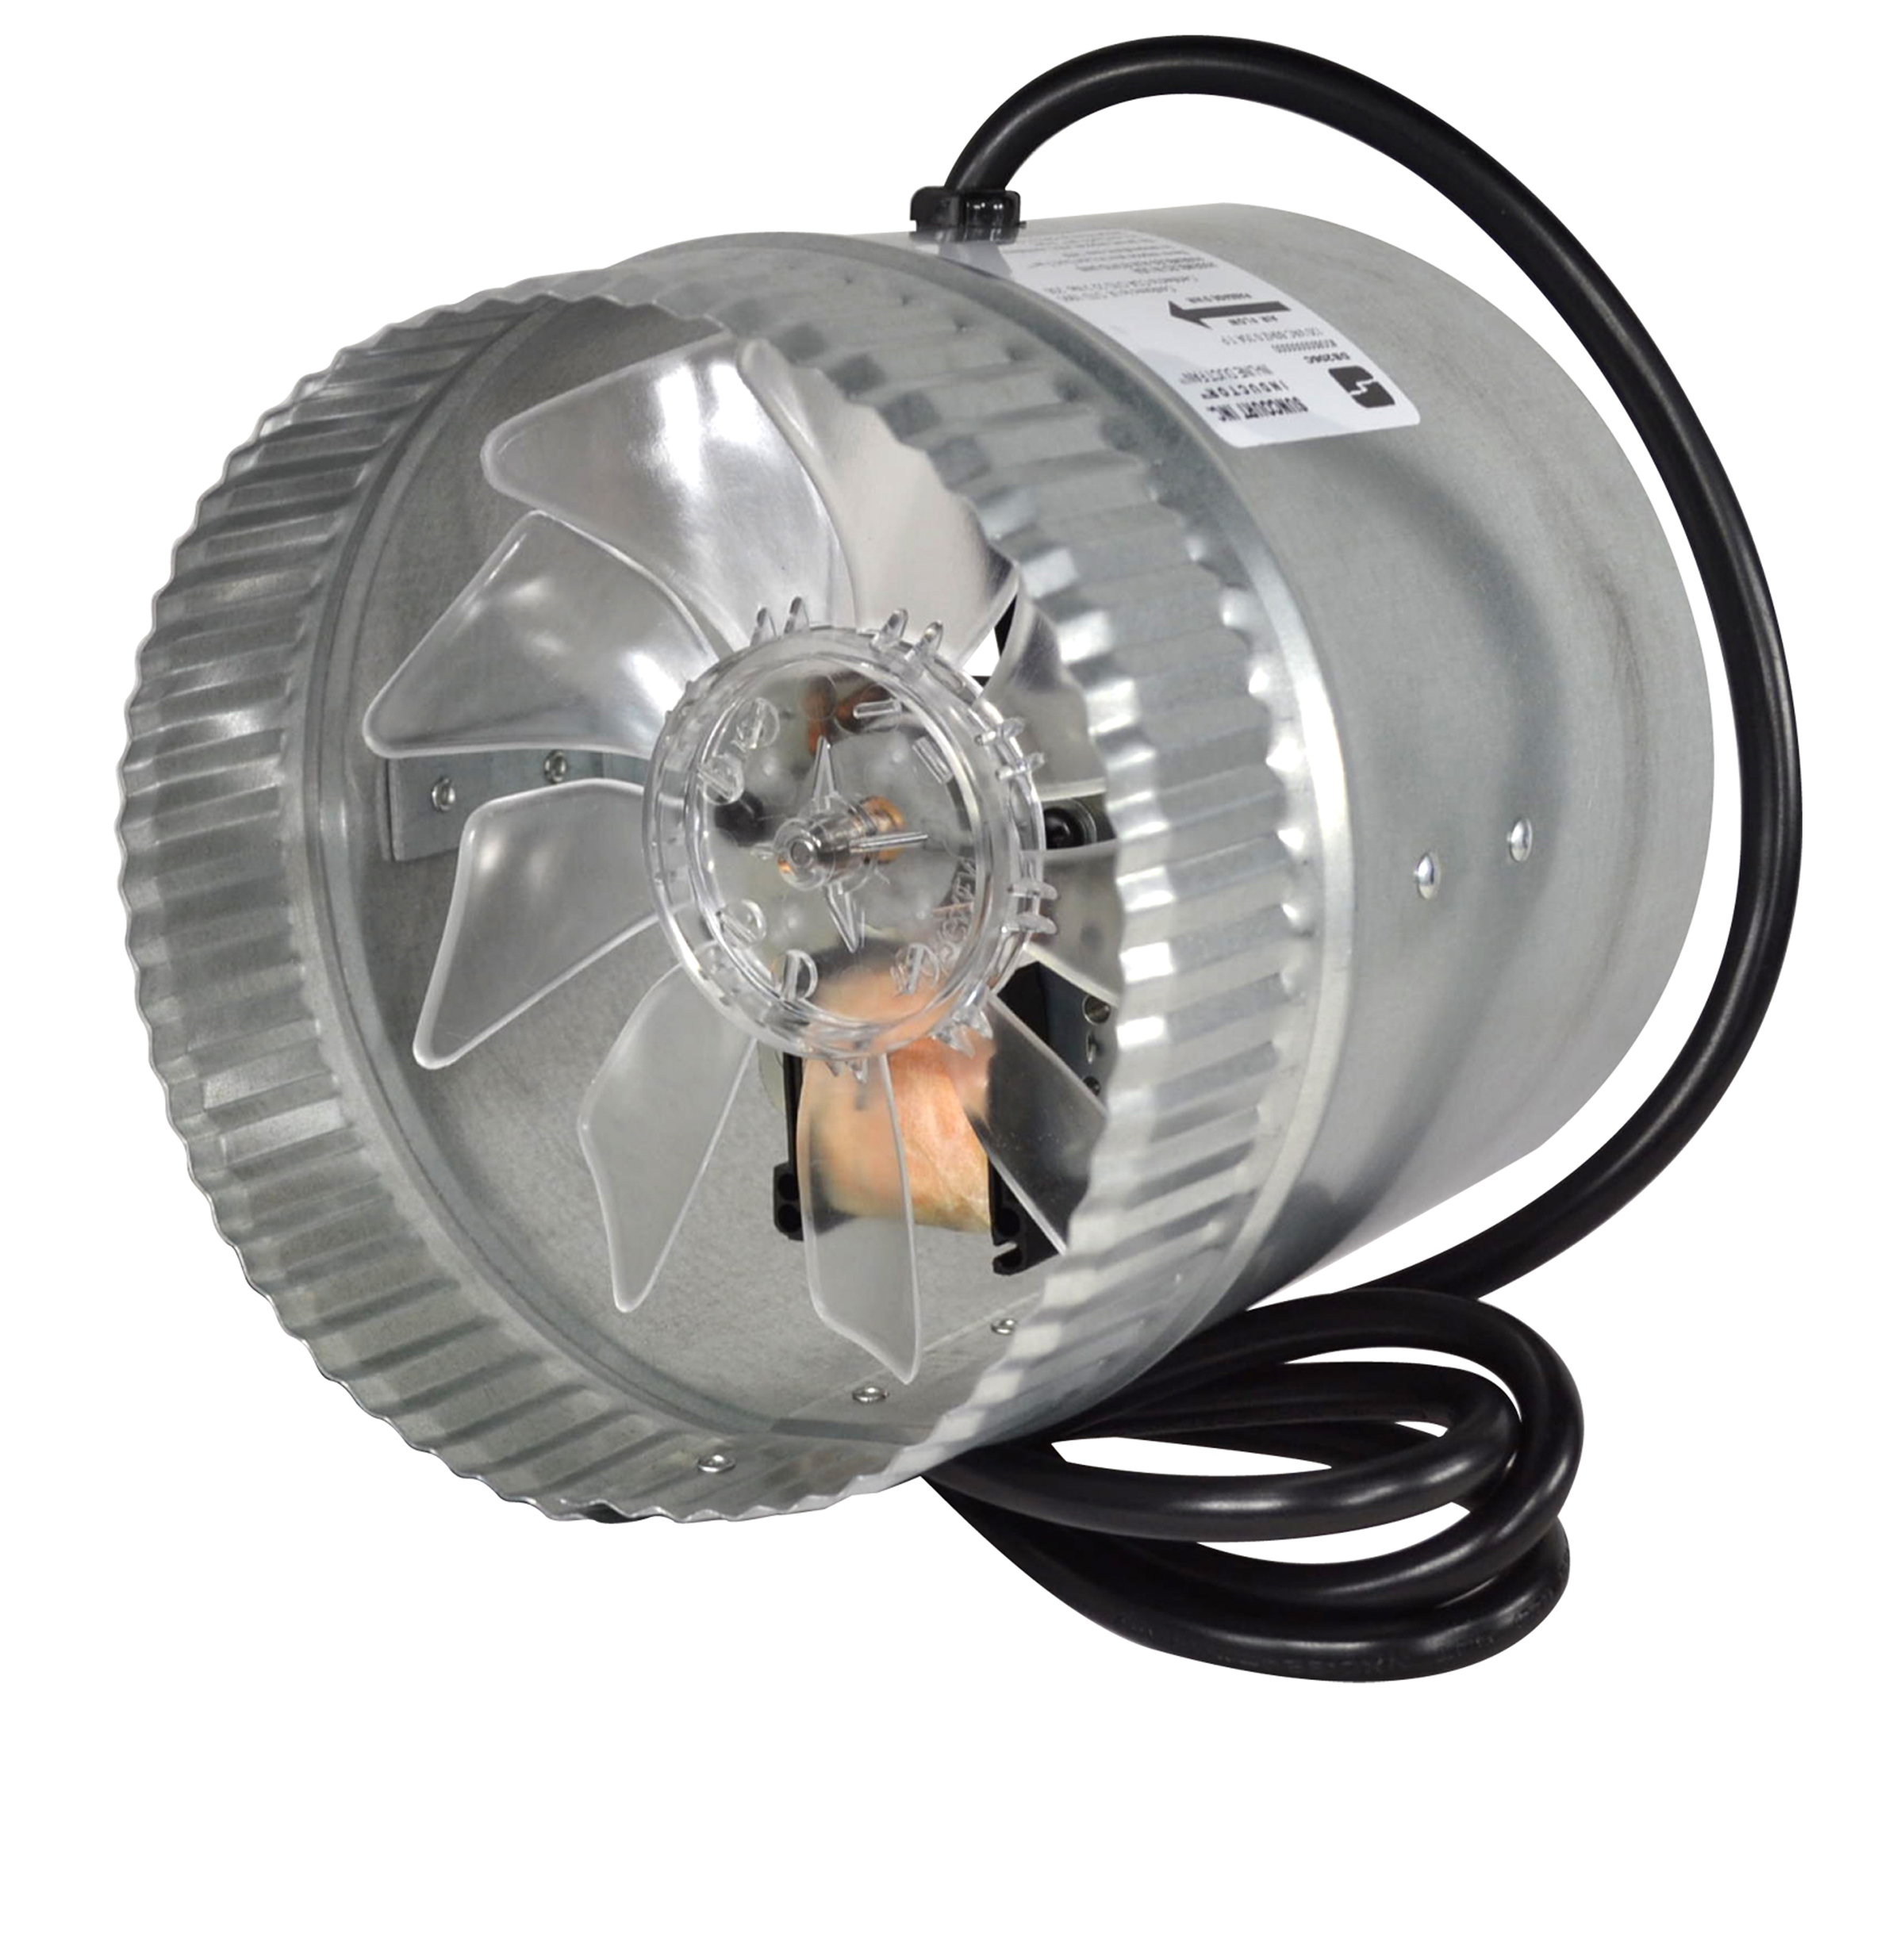 wiring a xpelair fan 1999 gmc sierra 2500 diagram duct library